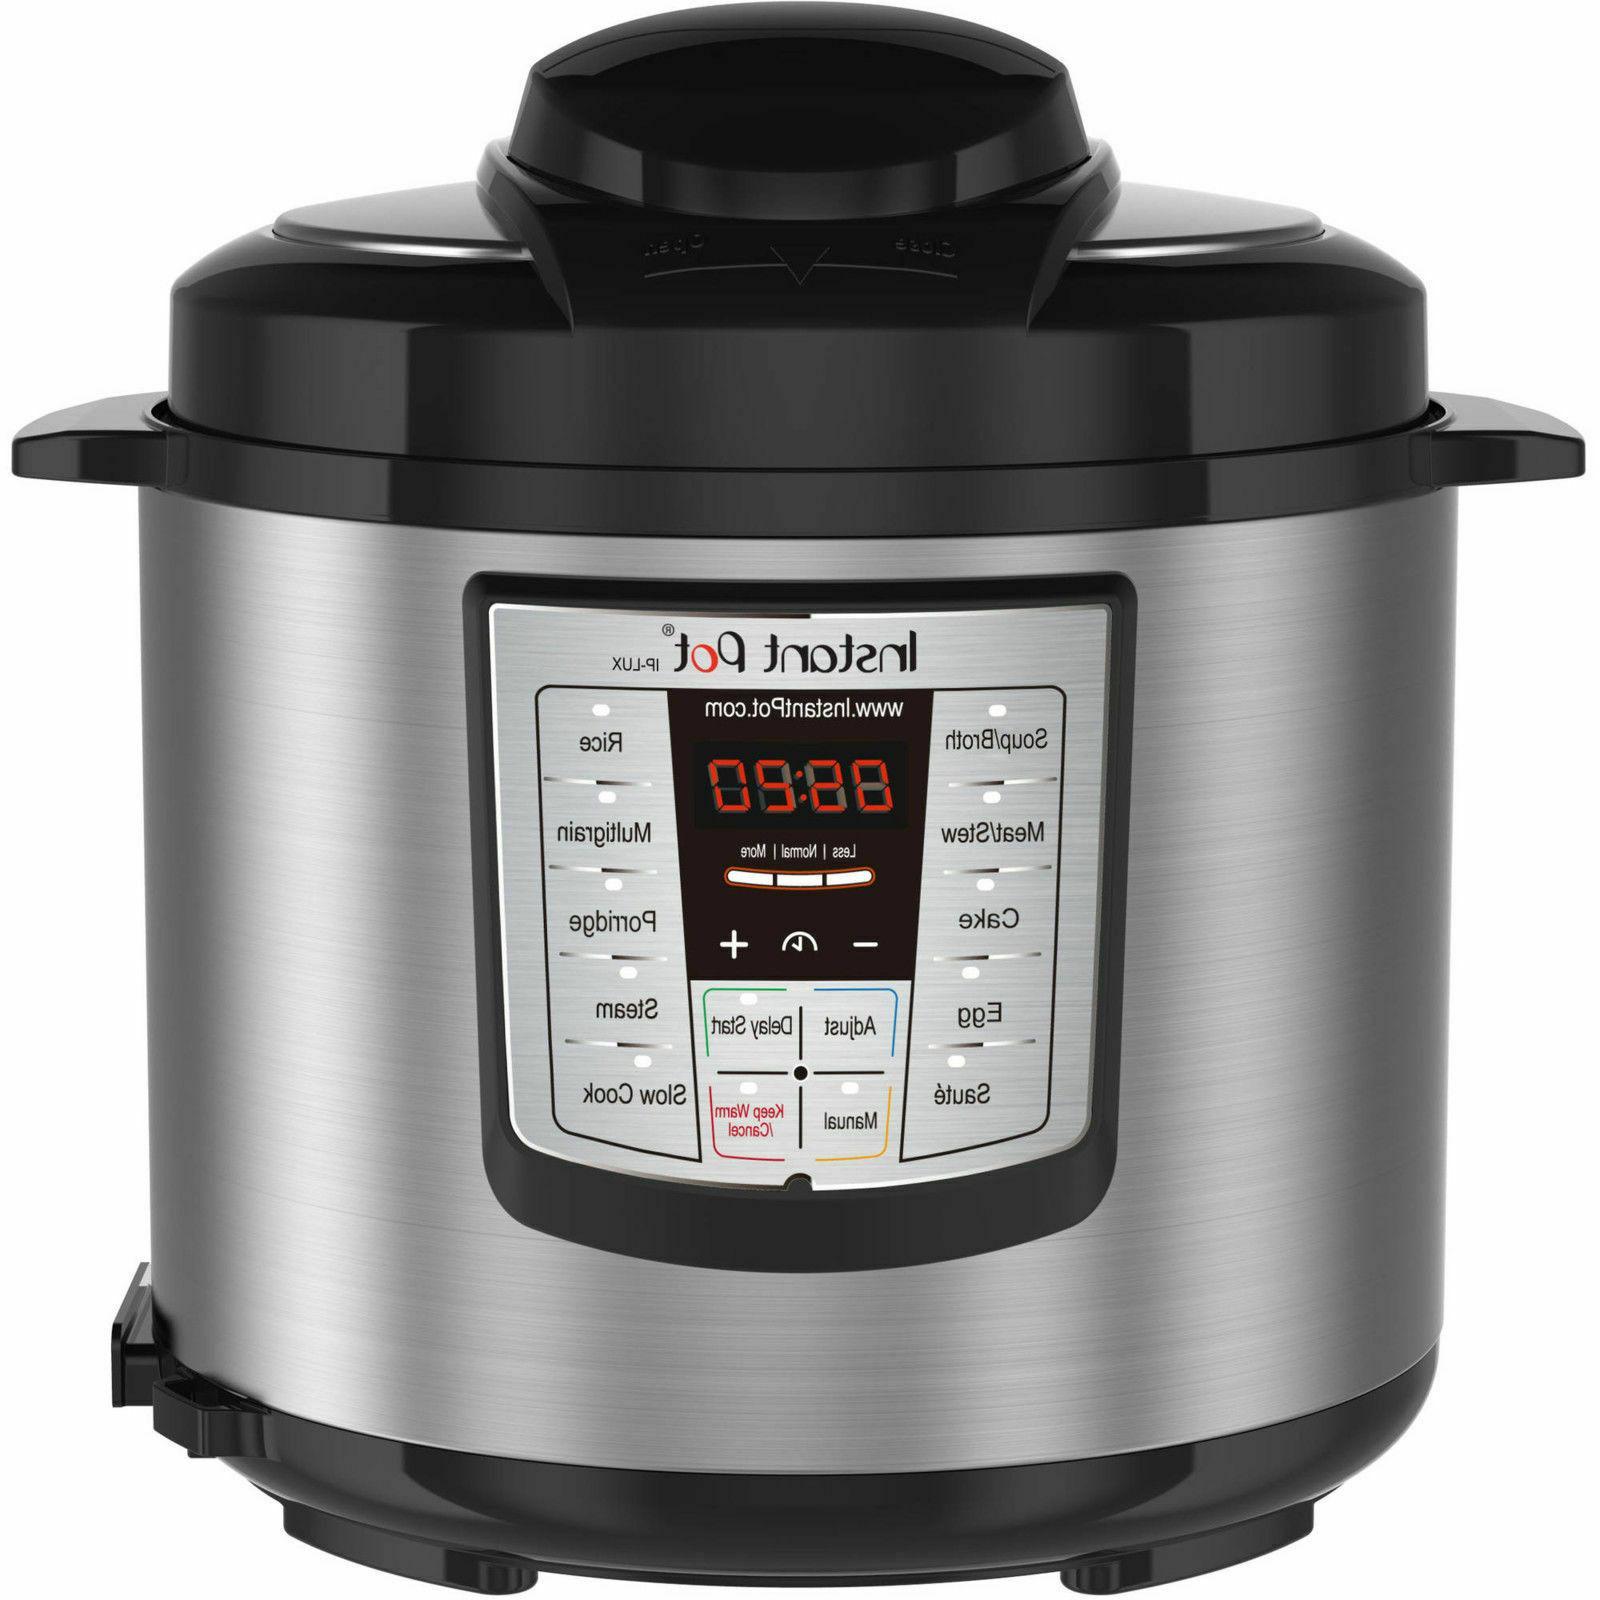 programmable pressure slow cooker 6 qt 6